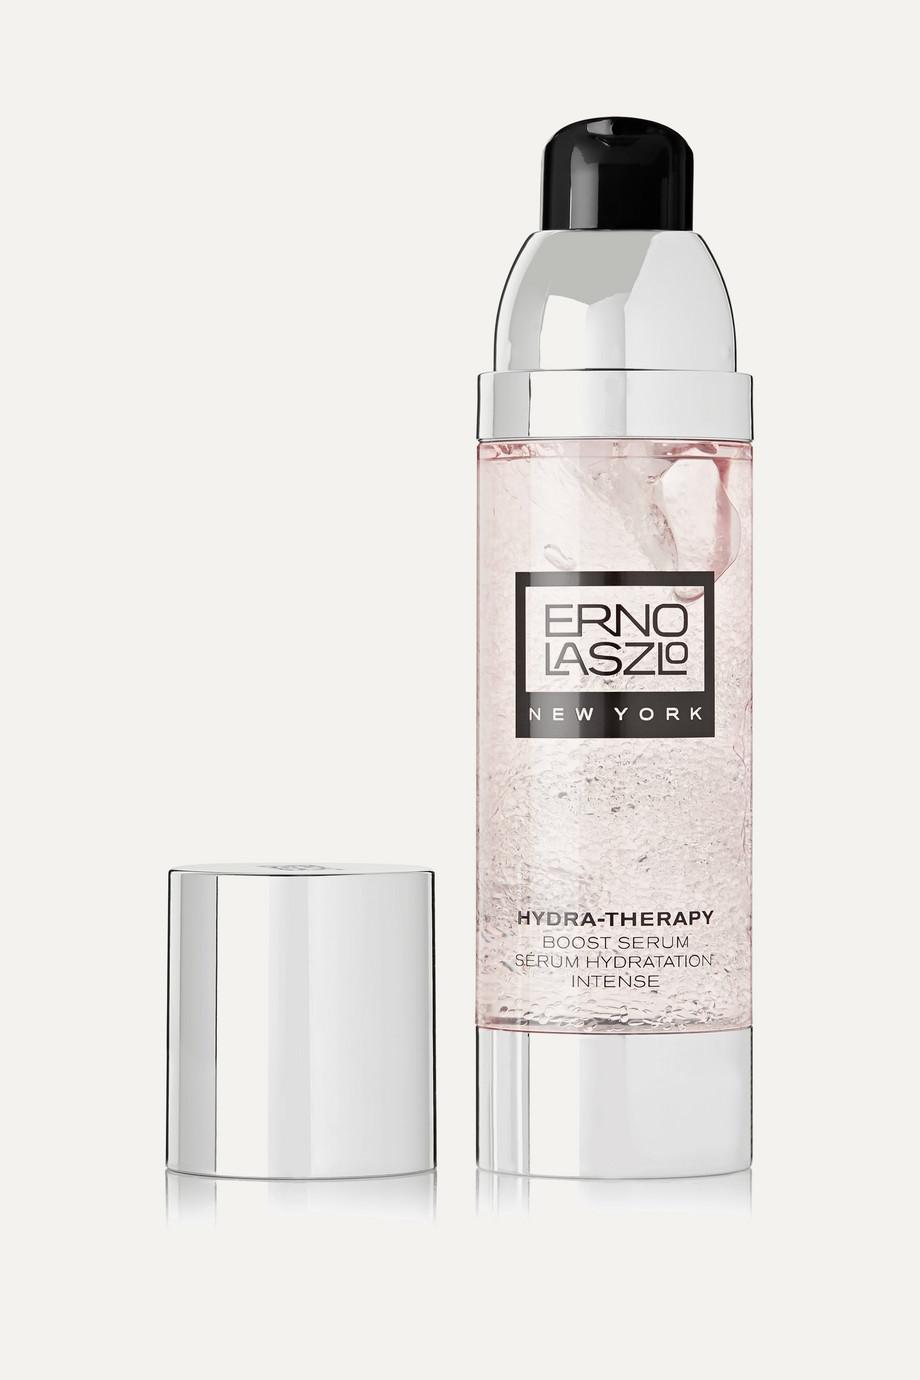 Erno Laszlo Hydra-Therapy Boost Serum, 30ml